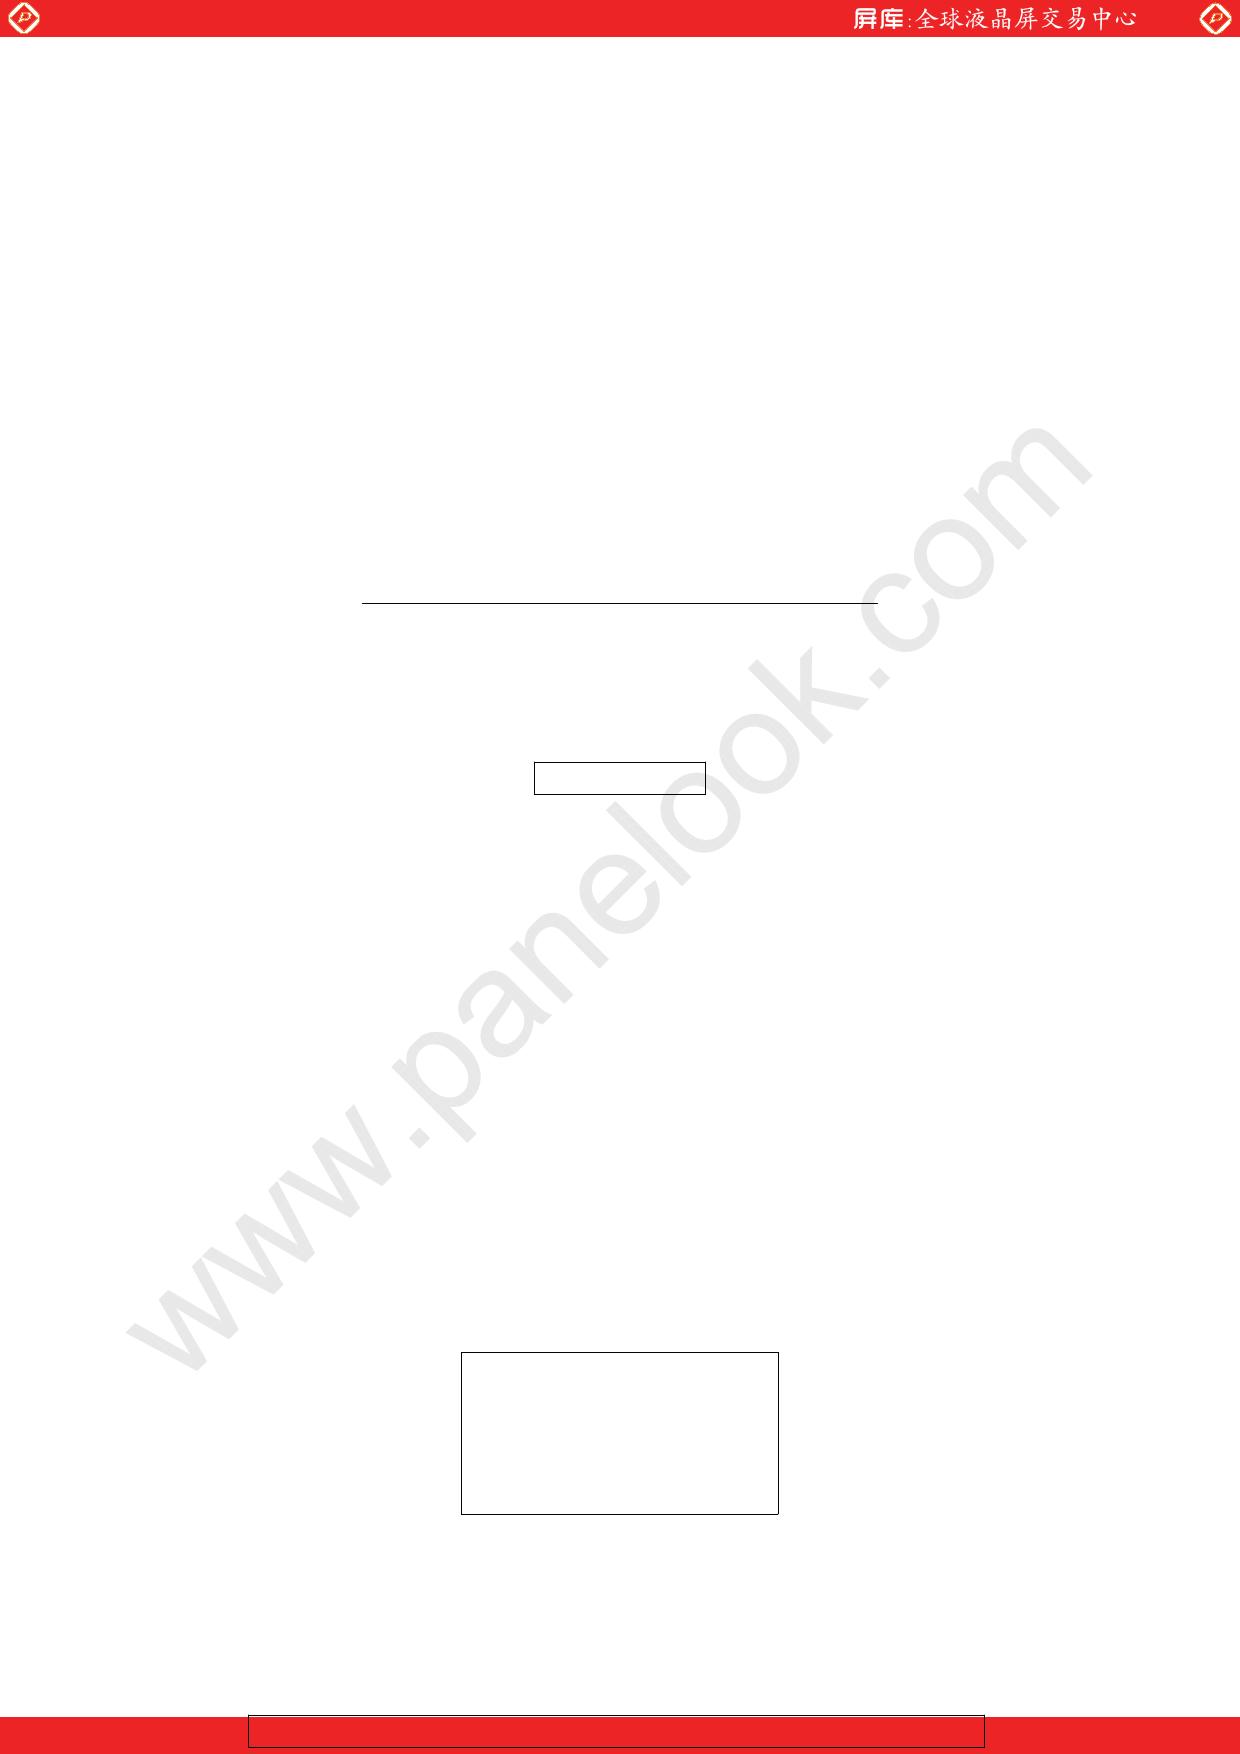 LTF550HF06-A01 دیتاشیت PDF